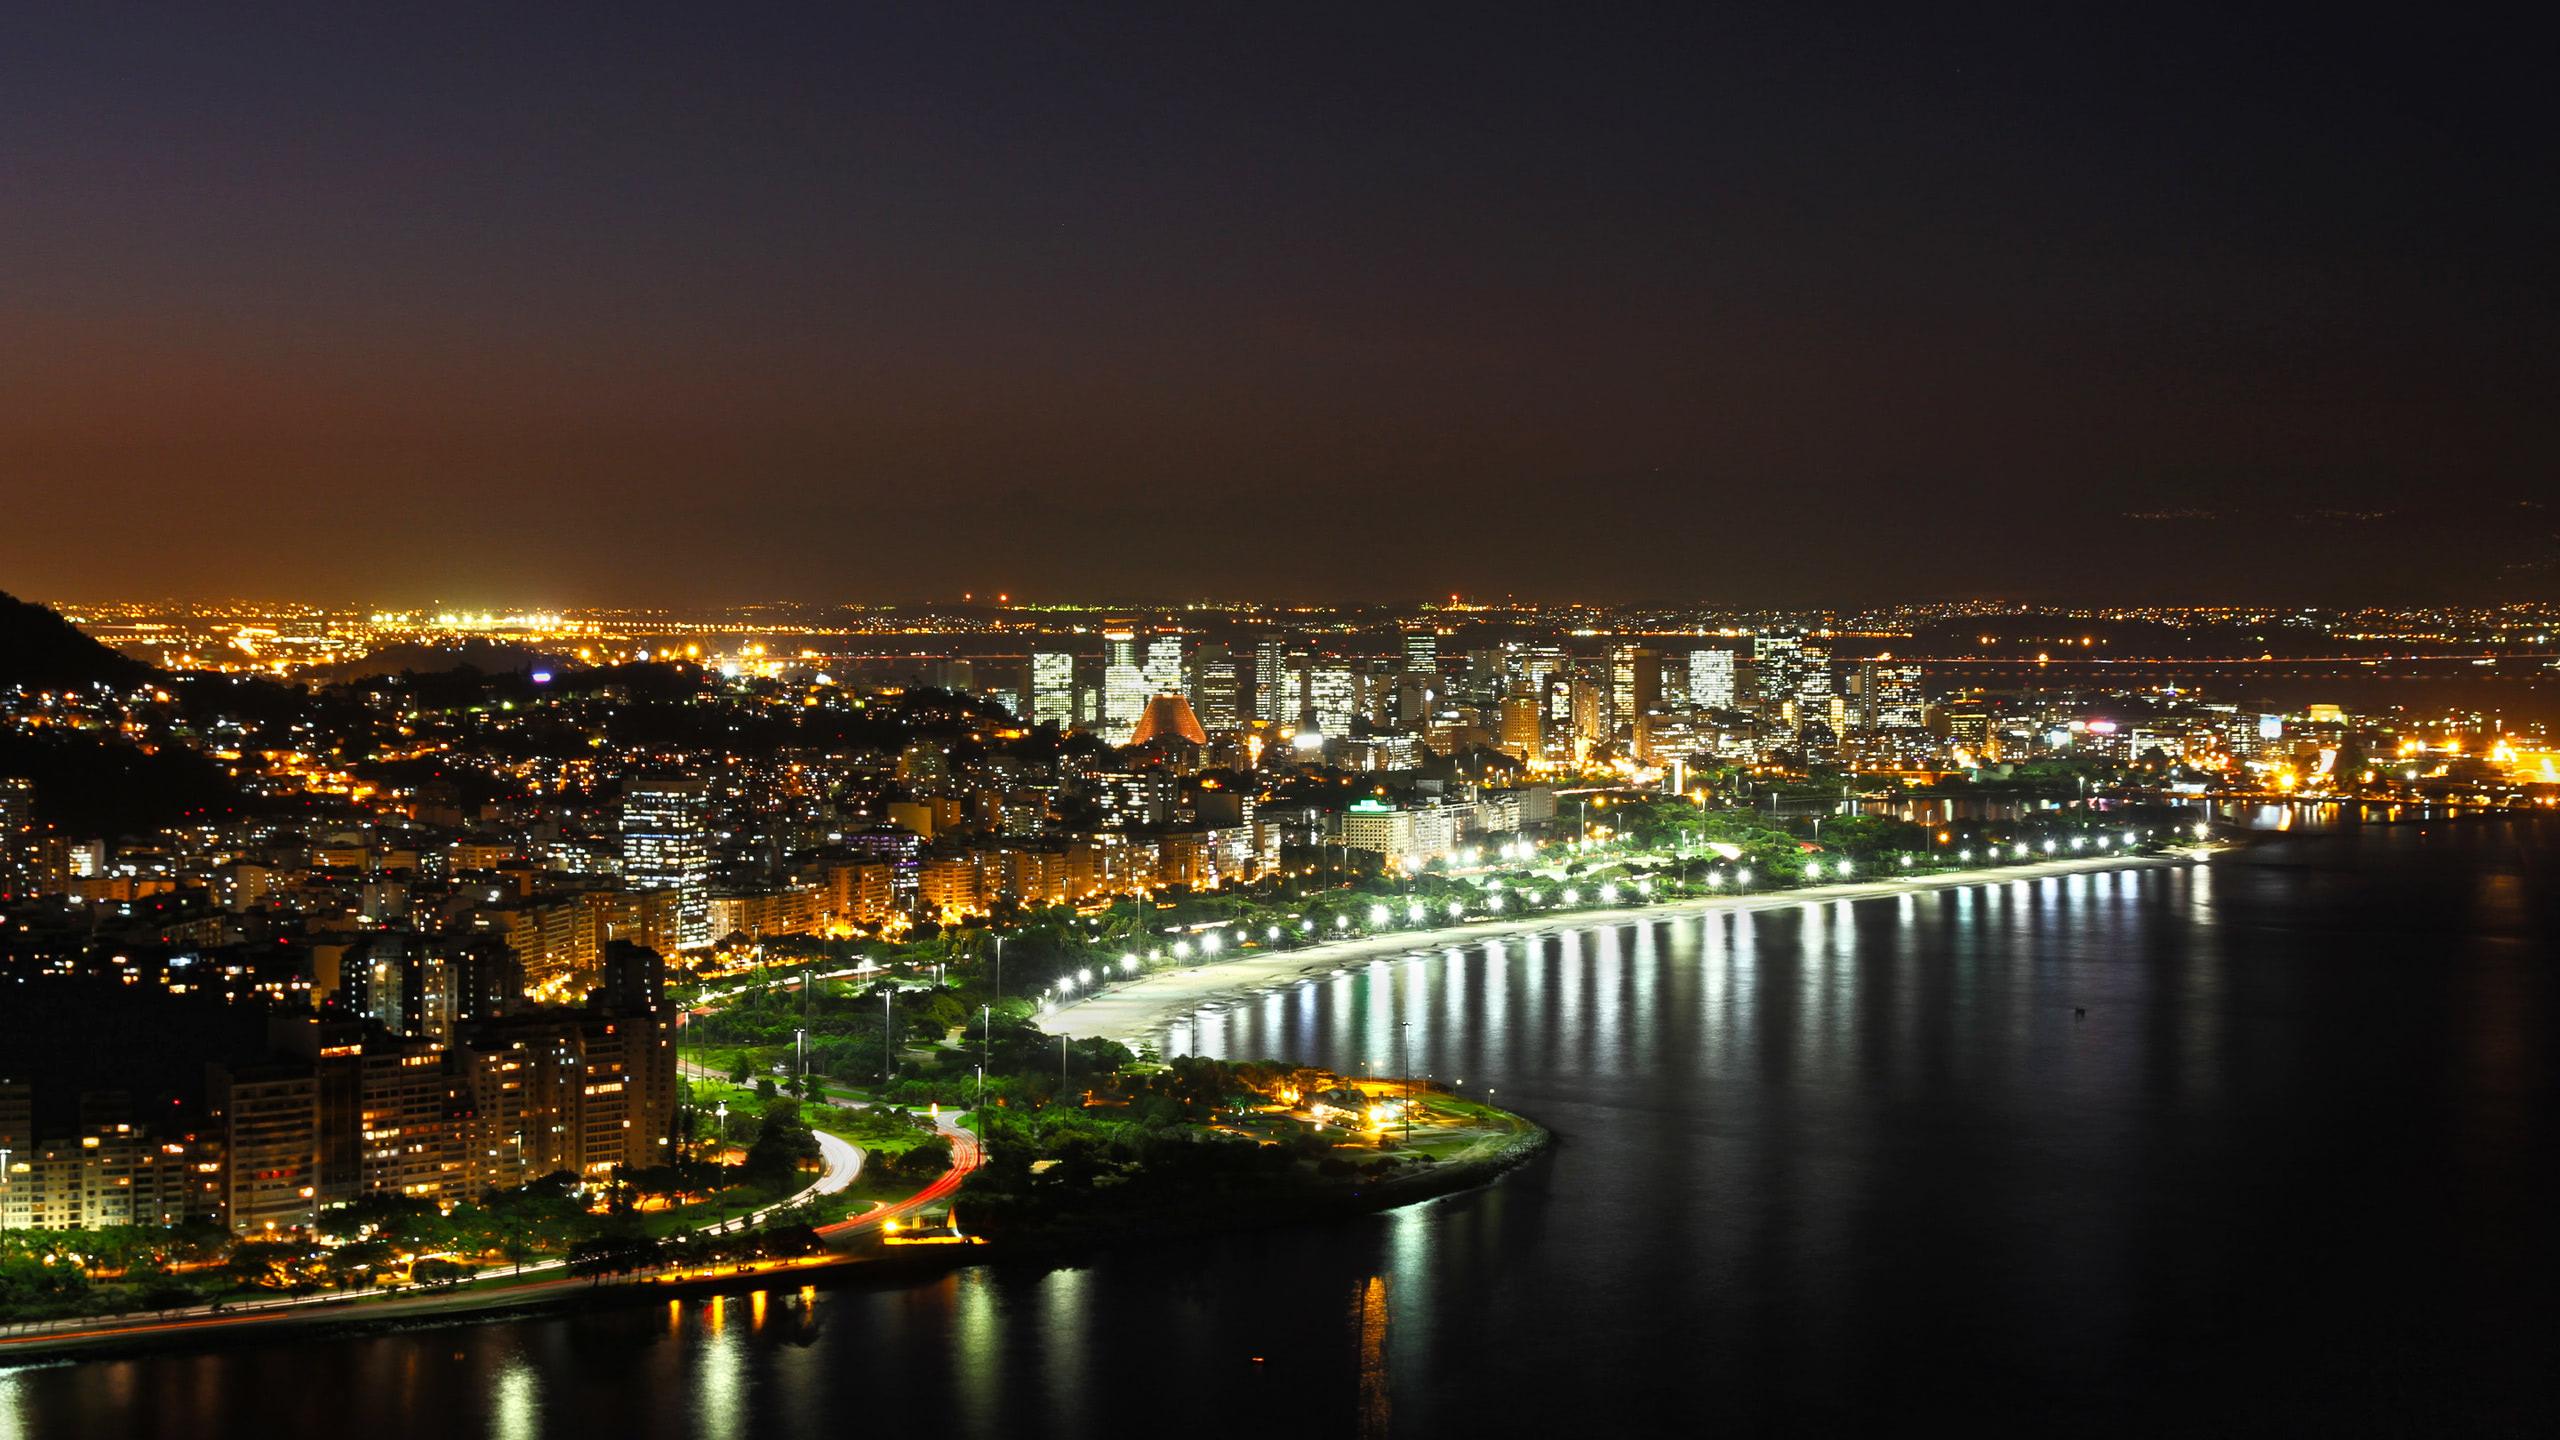 Exciting view of Rio de Janeiro at night wallpaper - Beach ...